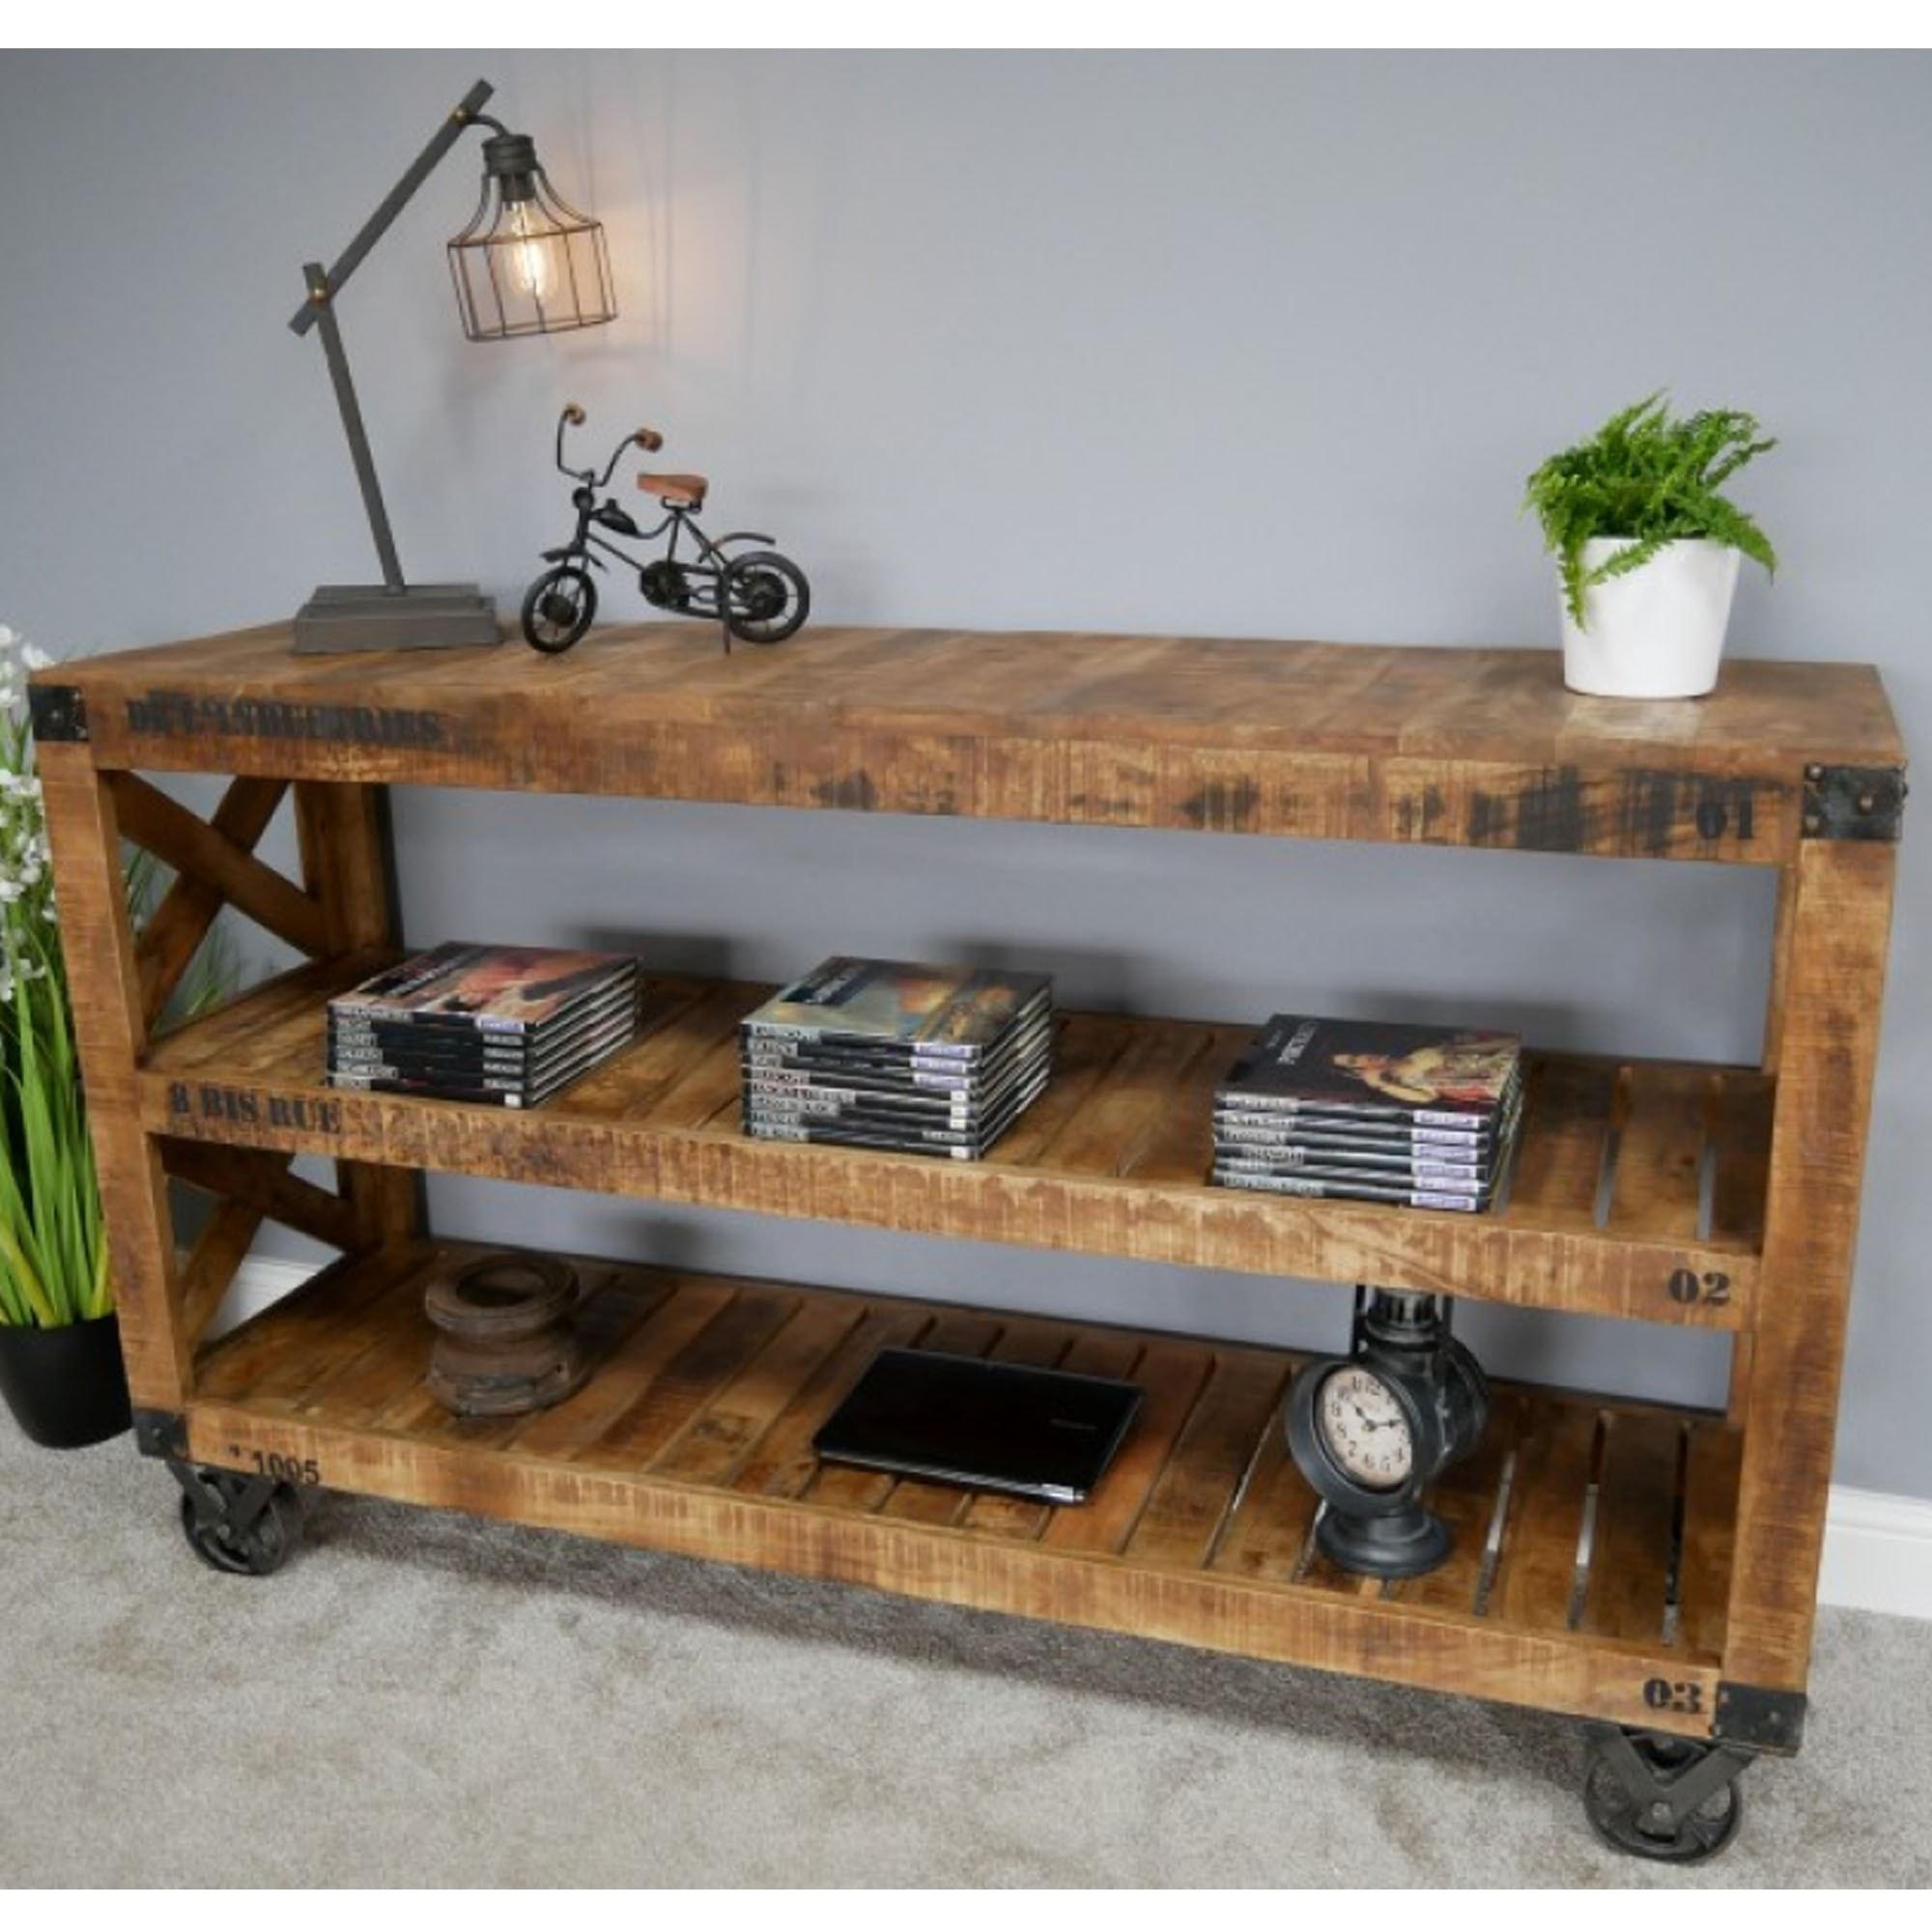 Mango Wood Industrial Shelves on Wheels